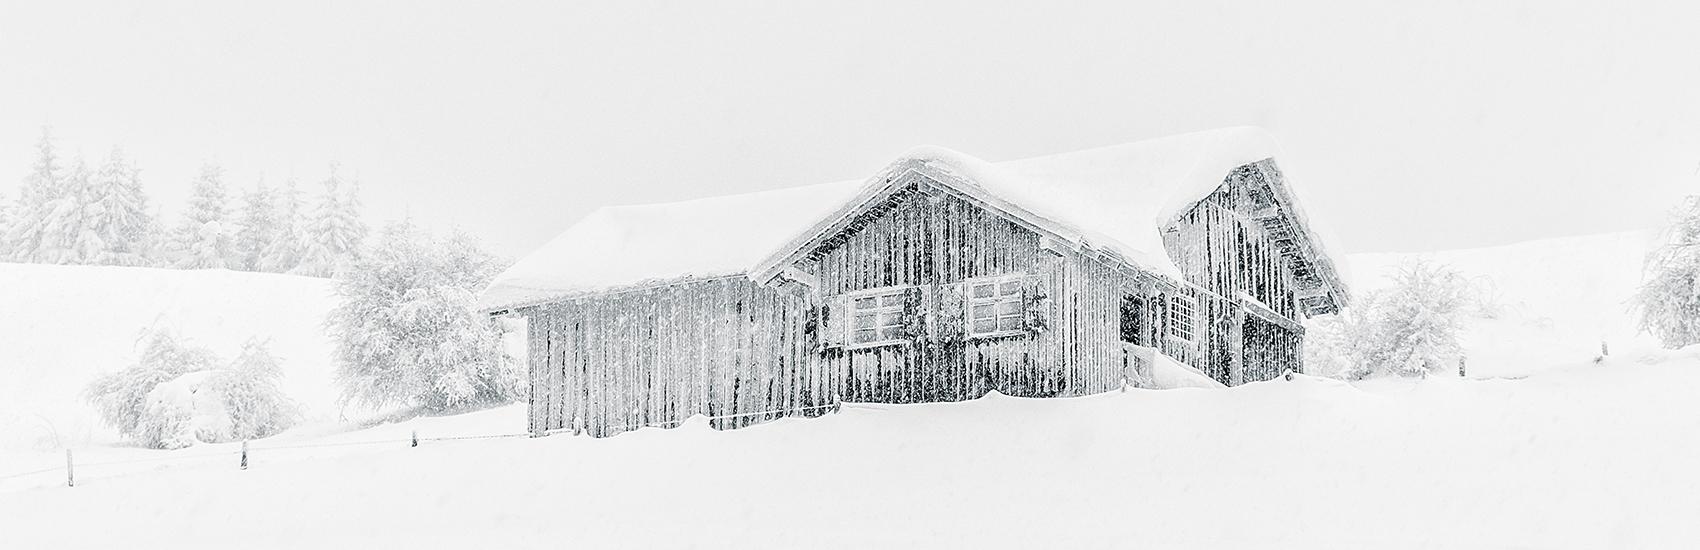 snowy-home